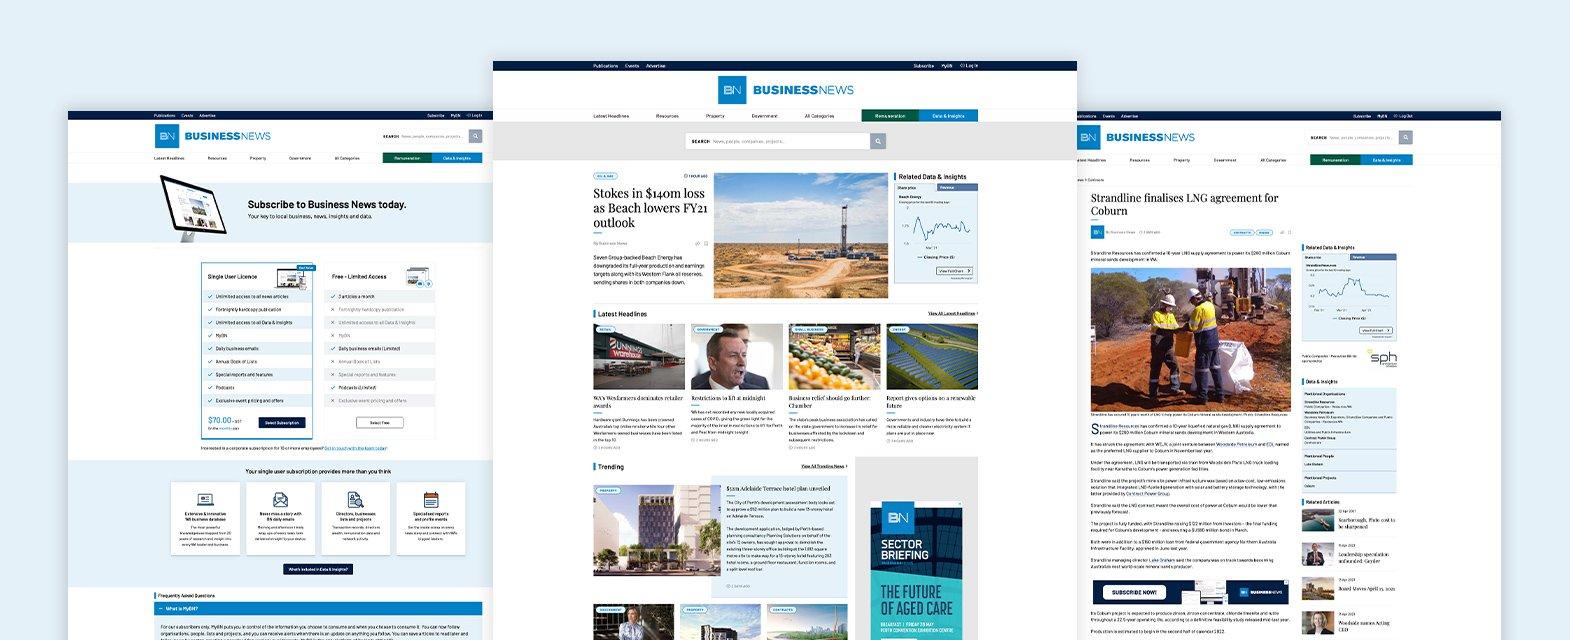 Business News Webpage